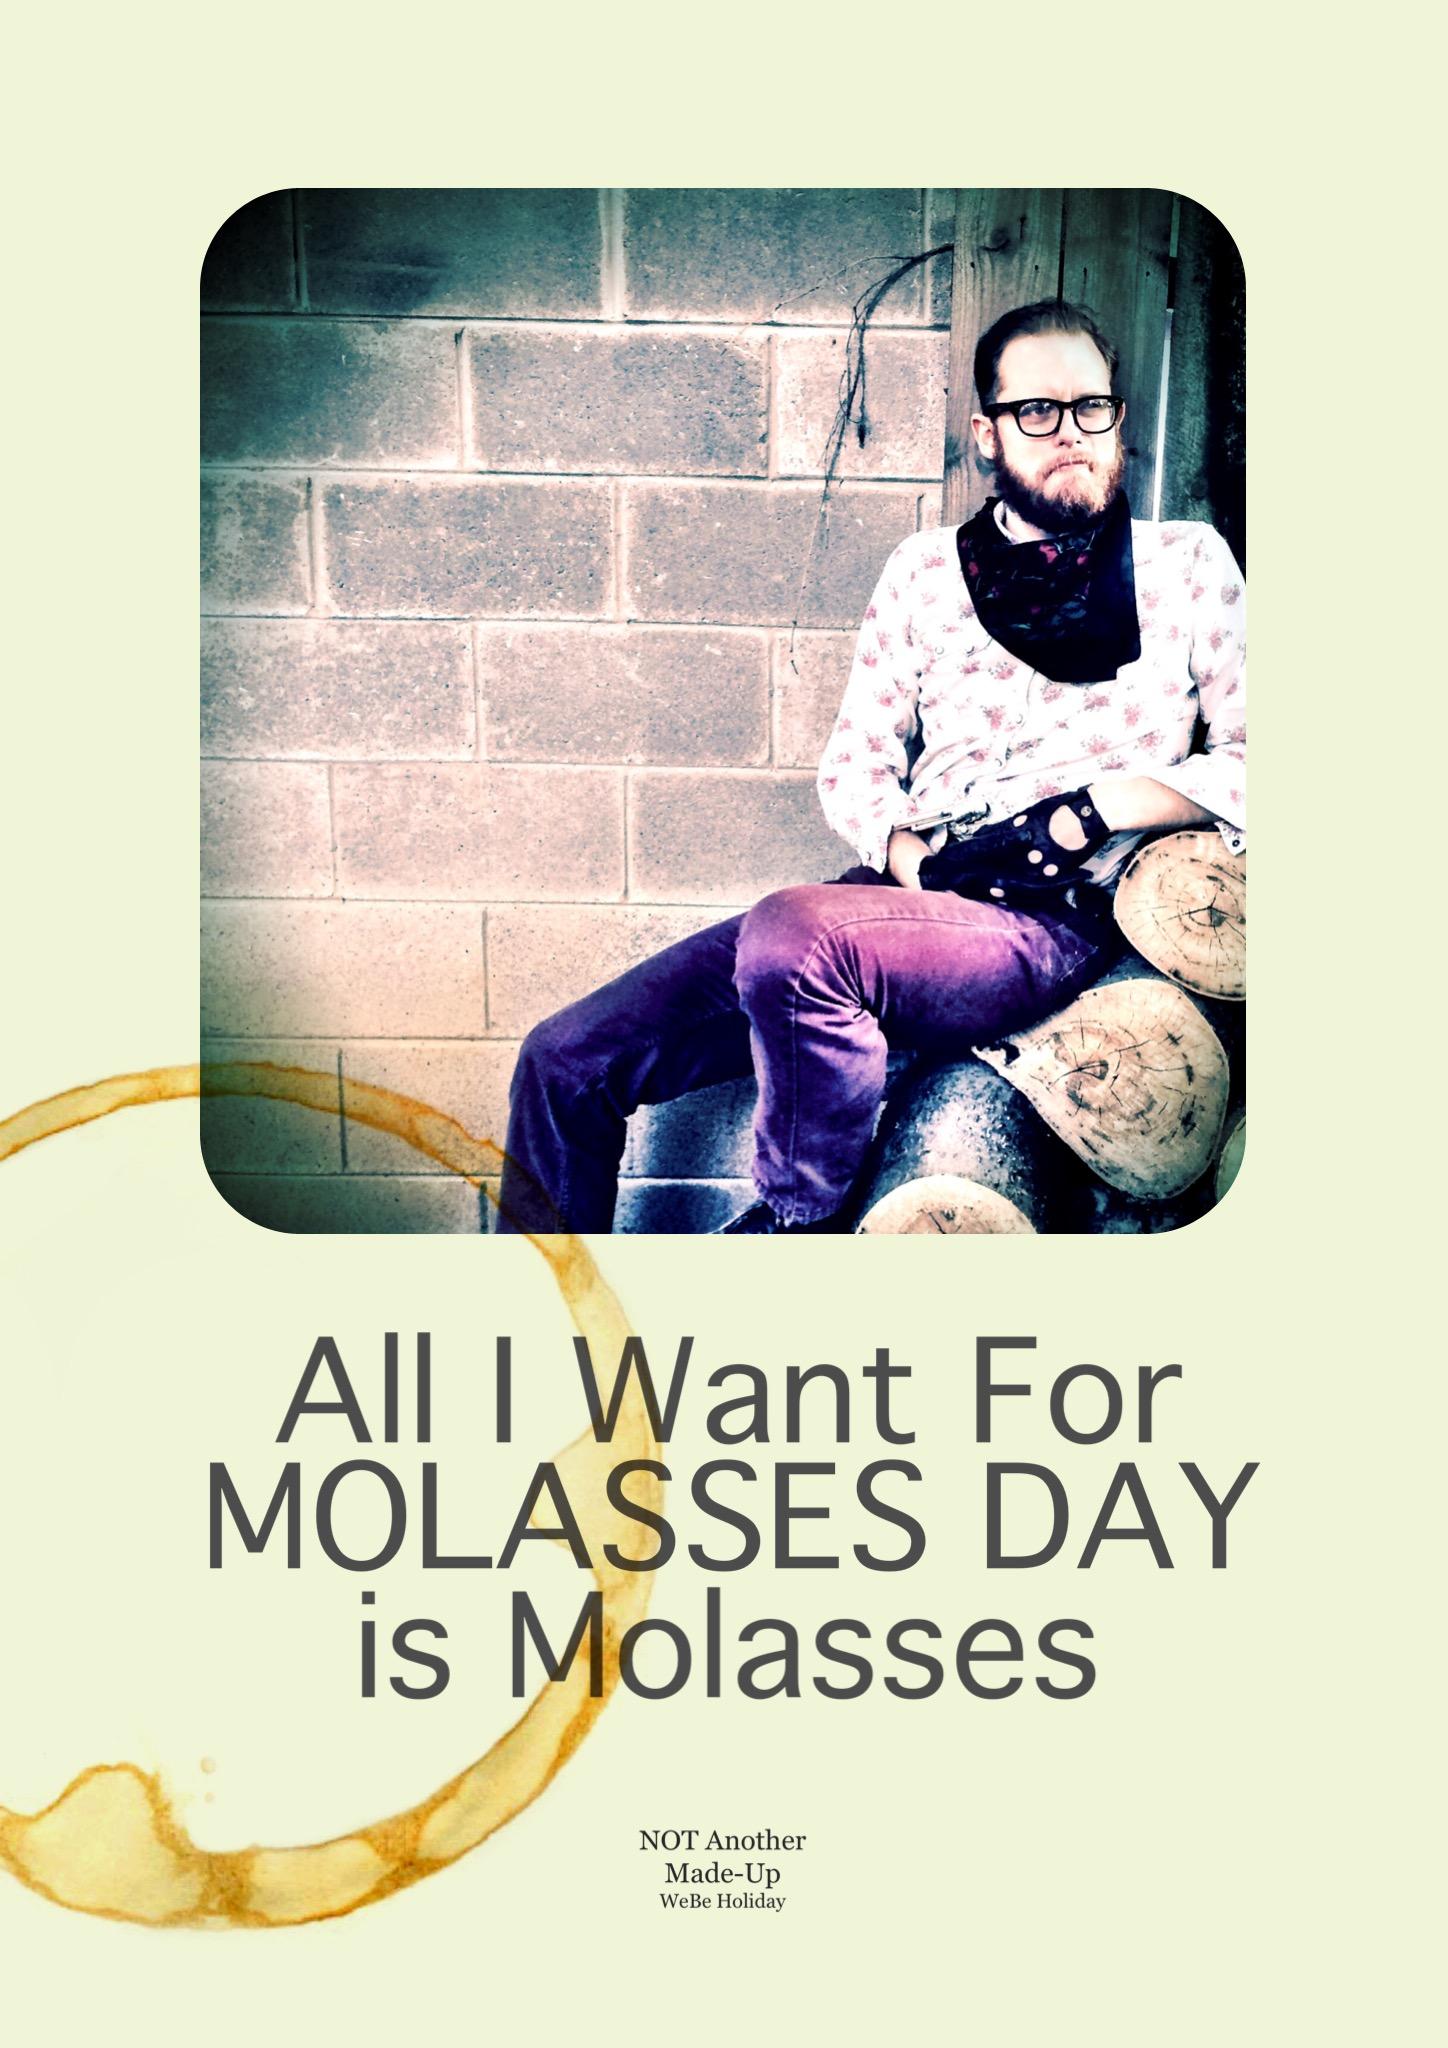 Molasses Day 2014 - Jason.jpg